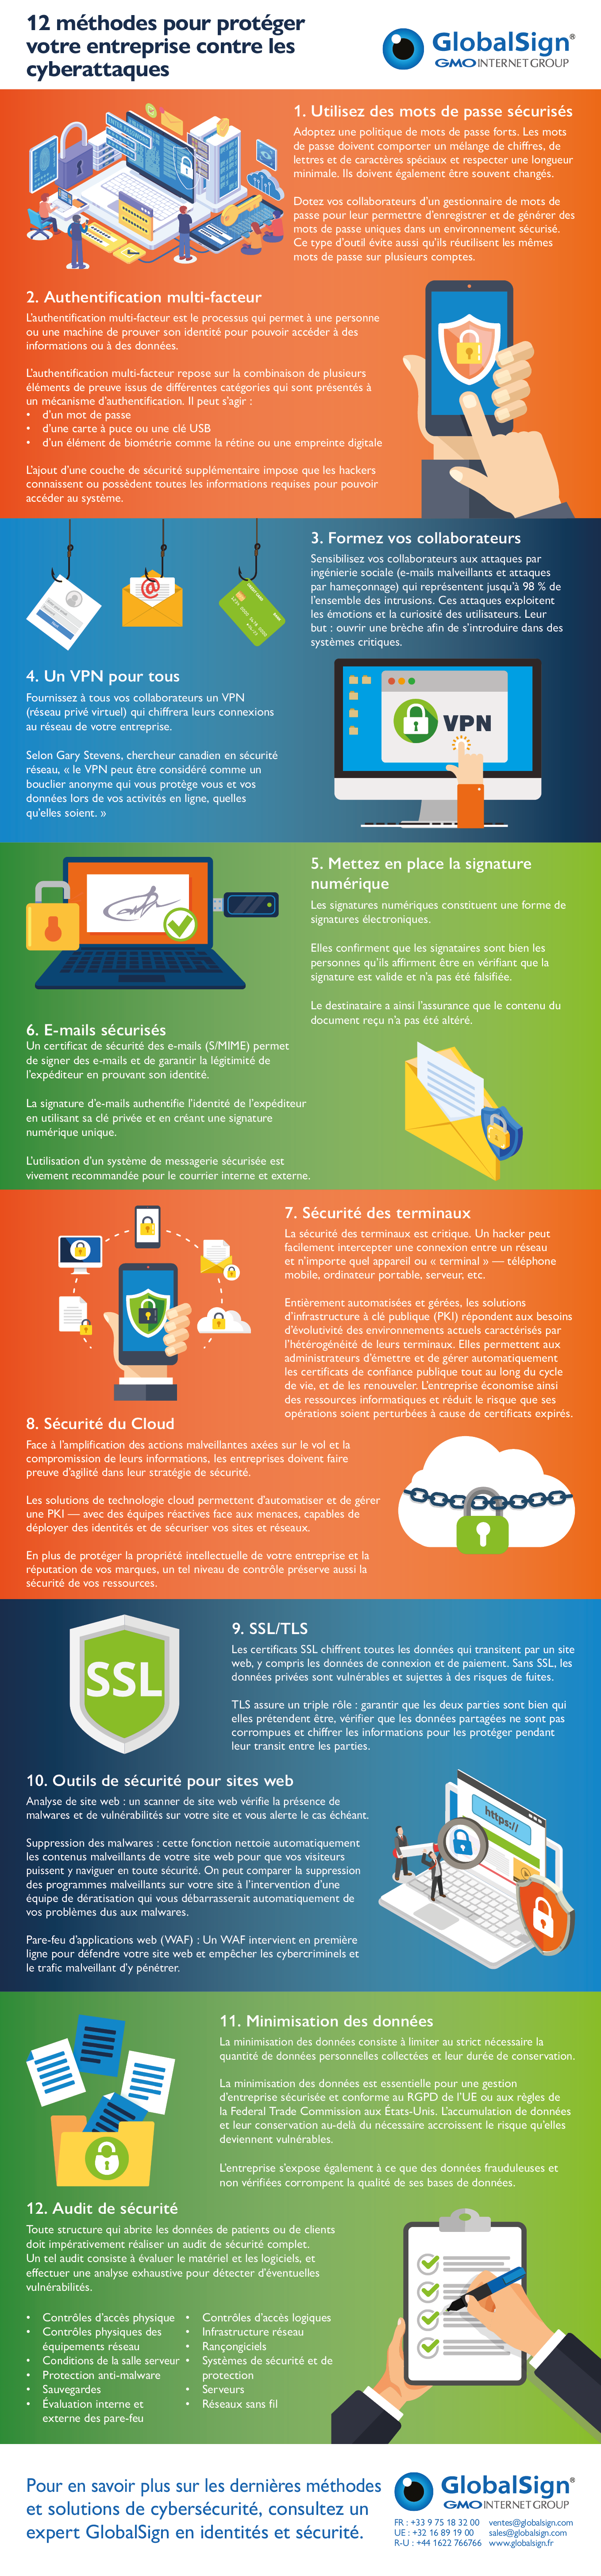 12 cybersecurity methods.jpg